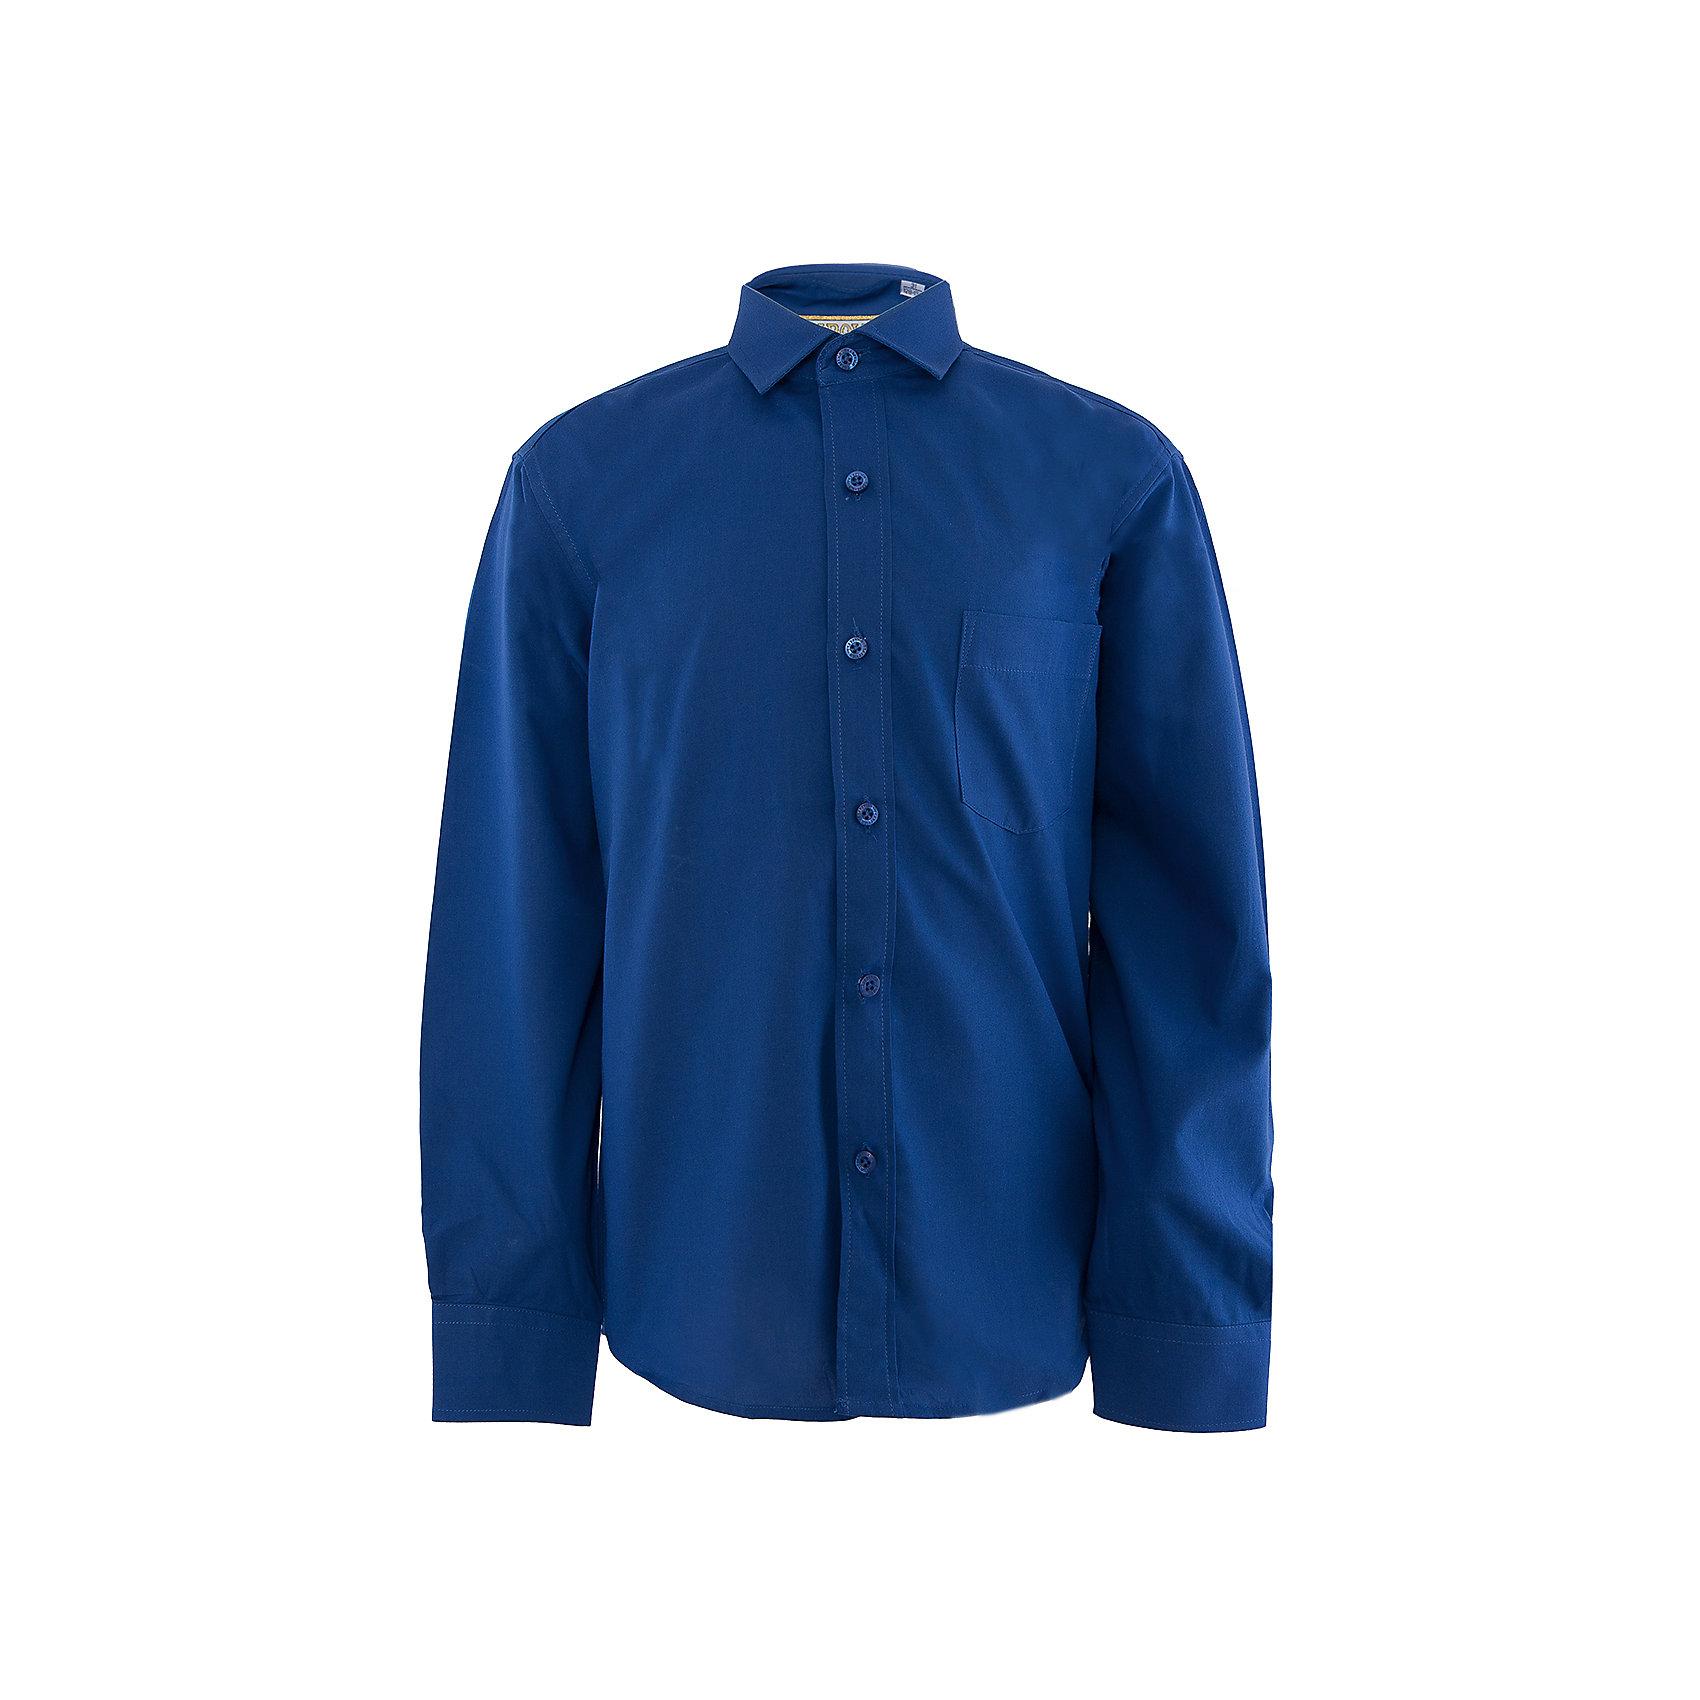 Рубашка для мальчика  TsarevichБлузки и рубашки<br>Рубашка для мальчика от российской марки Tsarevich.<br>Состав:<br>80% хлопок  20% полиэстер<br><br>Ширина мм: 174<br>Глубина мм: 10<br>Высота мм: 169<br>Вес г: 157<br>Цвет: синий<br>Возраст от месяцев: 108<br>Возраст до месяцев: 120<br>Пол: Мужской<br>Возраст: Детский<br>Размер: 134/140,158/164,152/158,164/170,146/152,140/146,128/134,122/128<br>SKU: 4163732